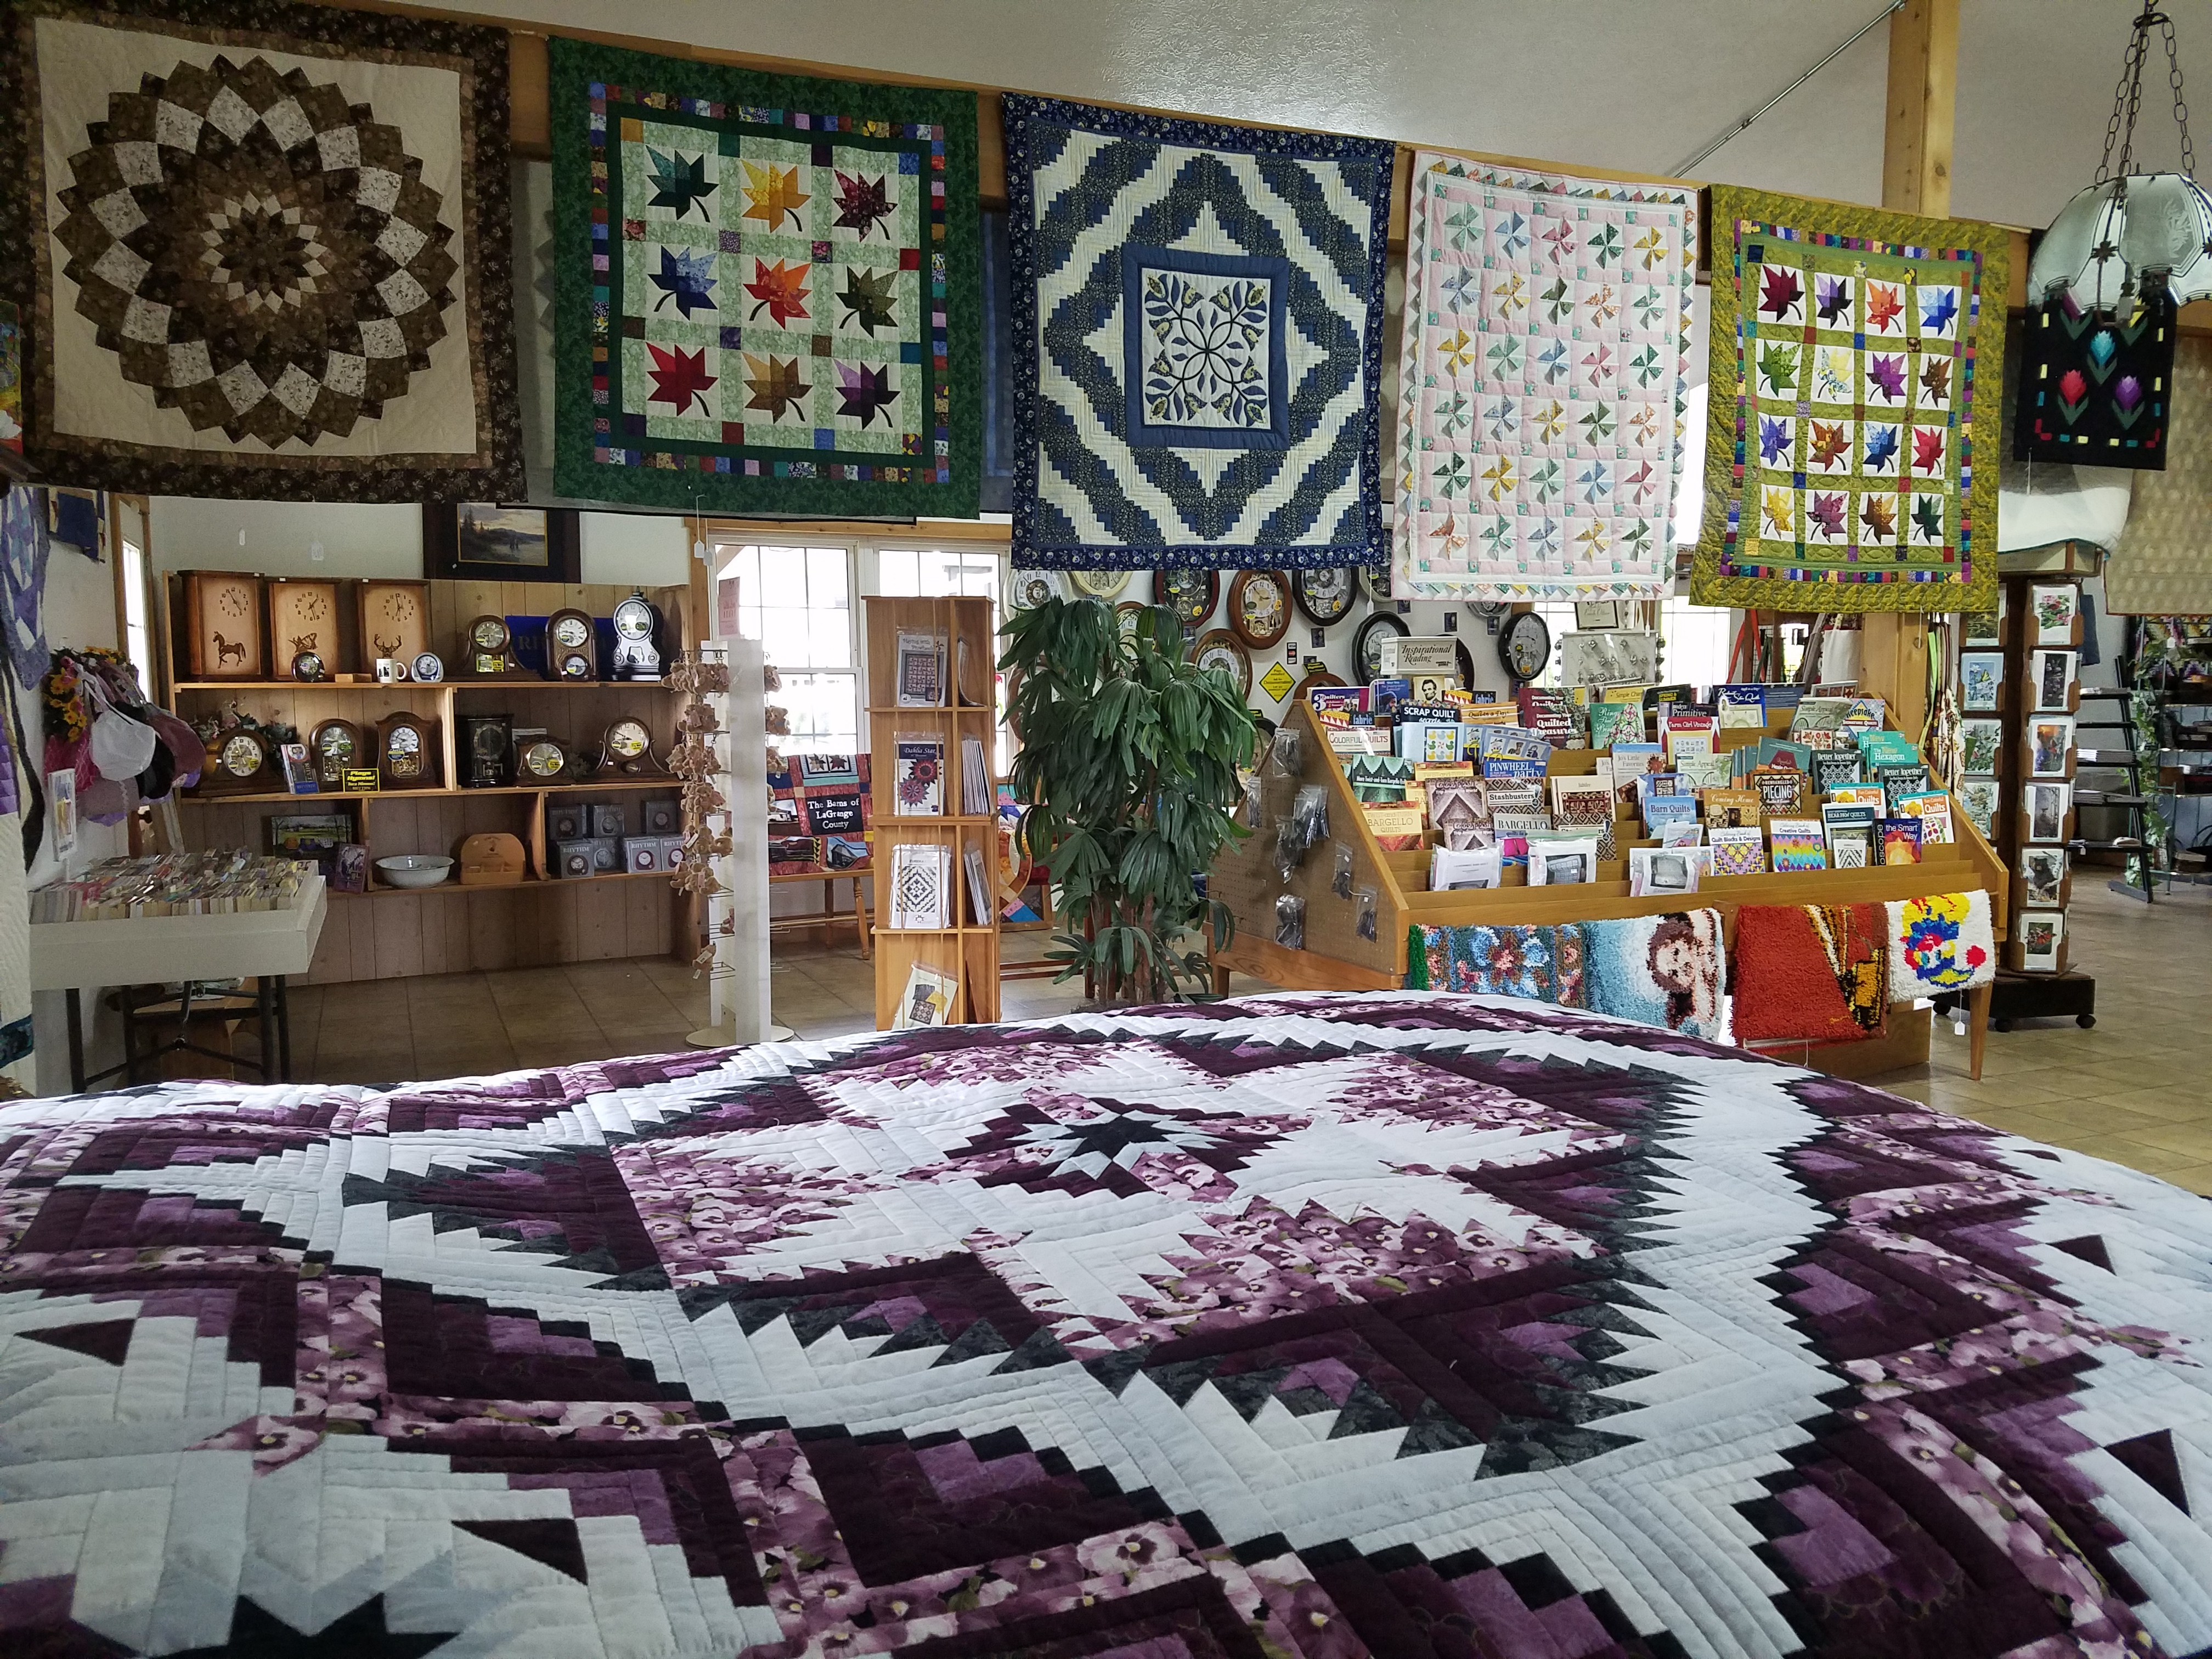 Little Helpers Quilt Shop, Shipshewana, IN | Dragonfly Quilts Blog : that quilt shop - Adamdwight.com